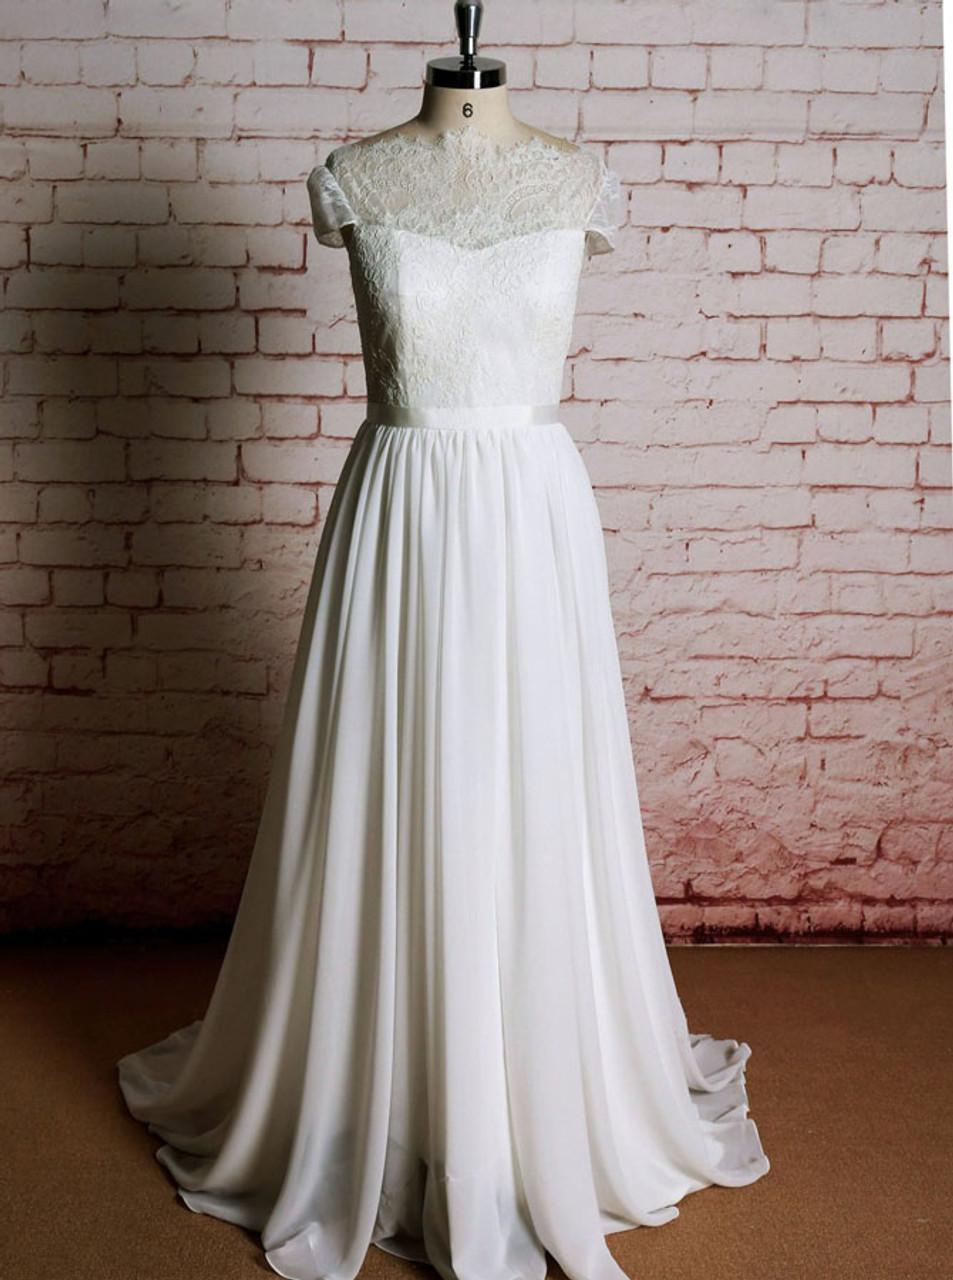 Boho Wedding Dresses With Short Sleeveschiffon Wedding Dress11615